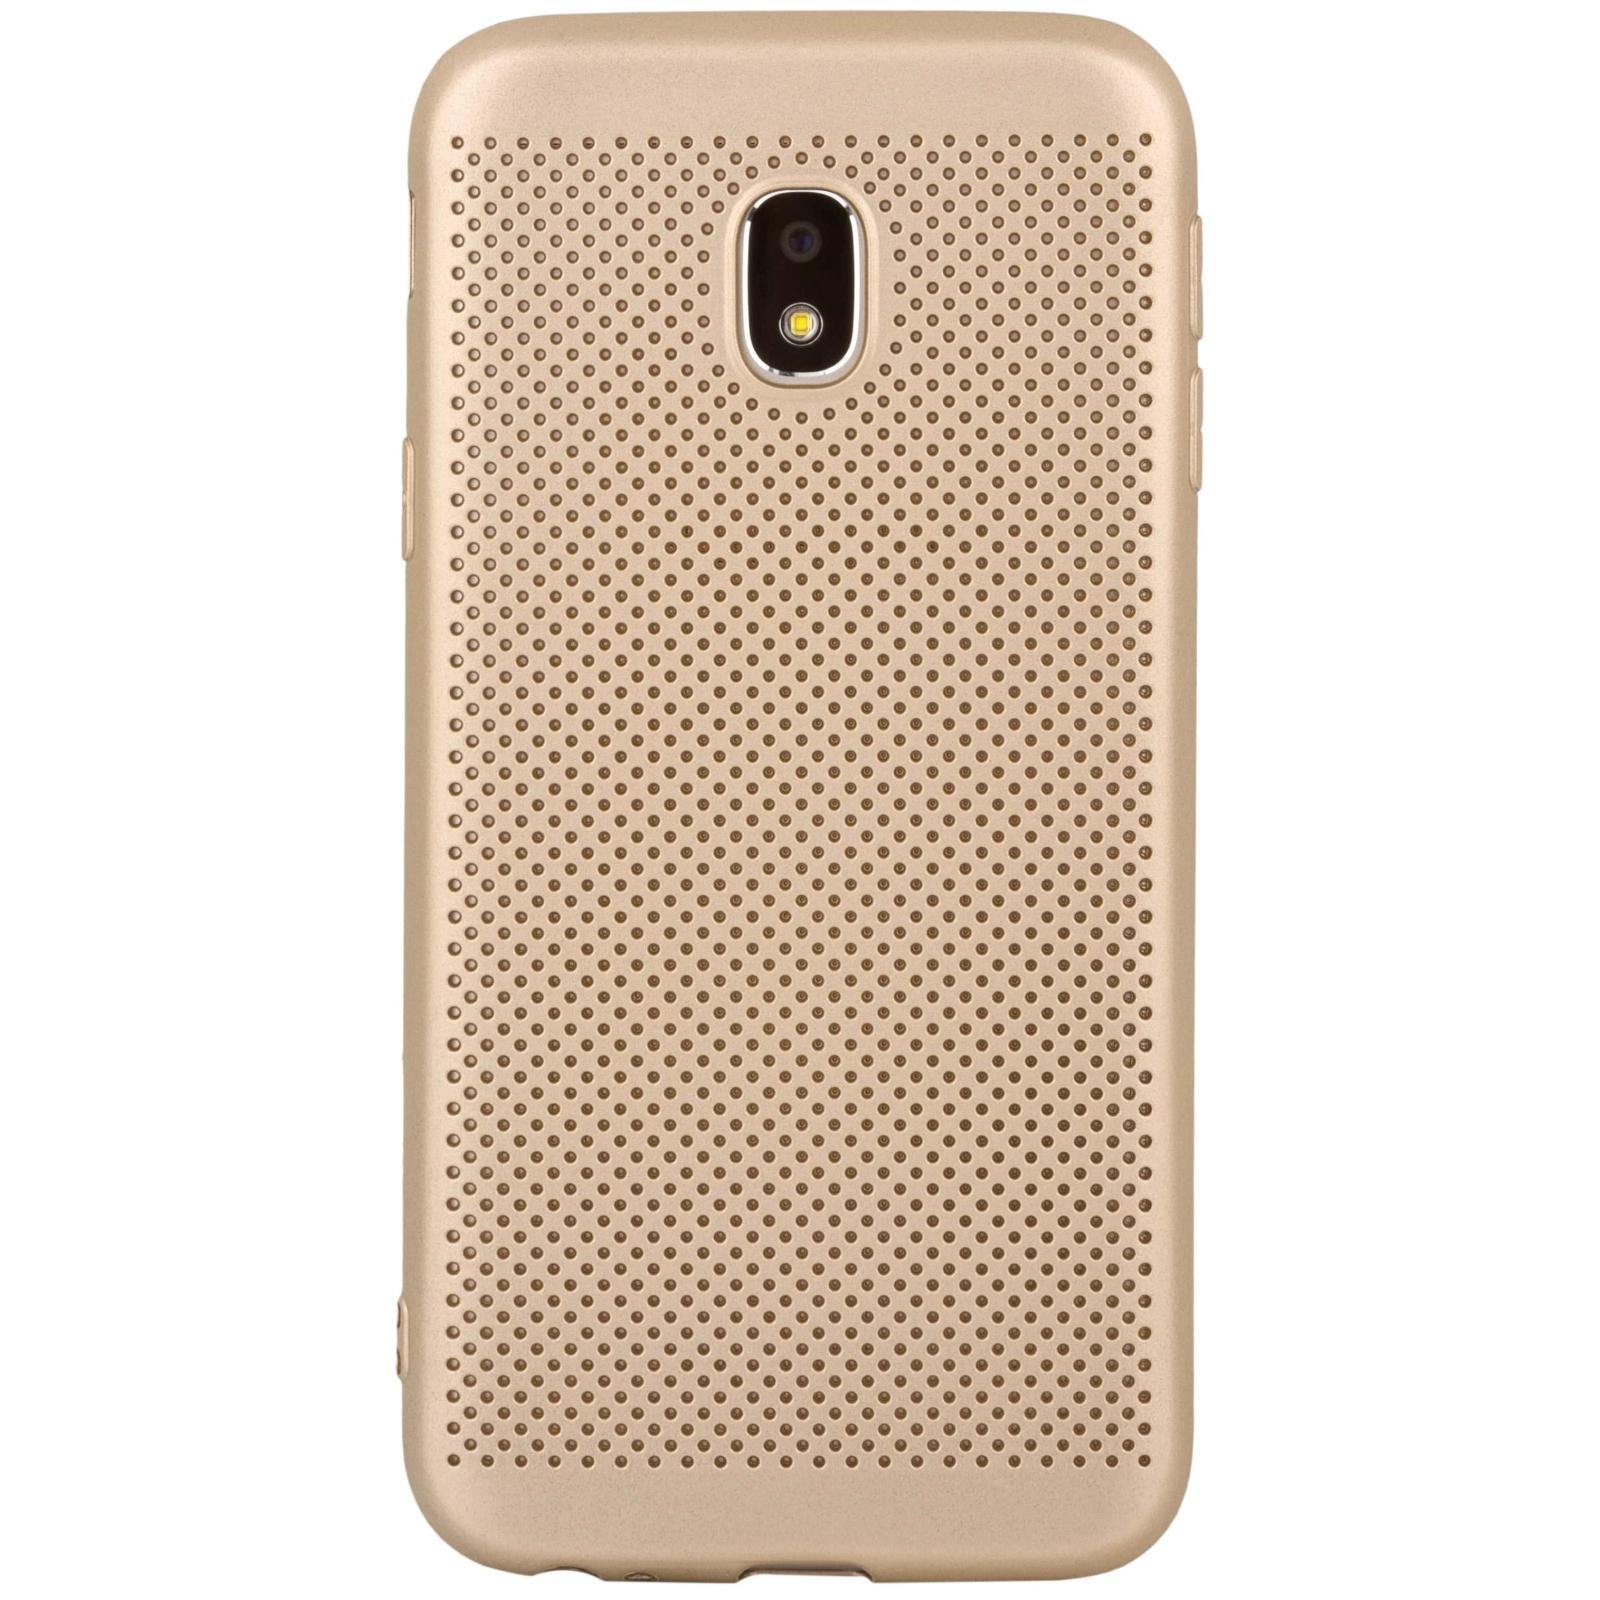 Чехол для моб. телефона MakeFuture Moon Case (TPU) для Samsung J5 2017 (J530) Gold (MCM-SJ530GD)